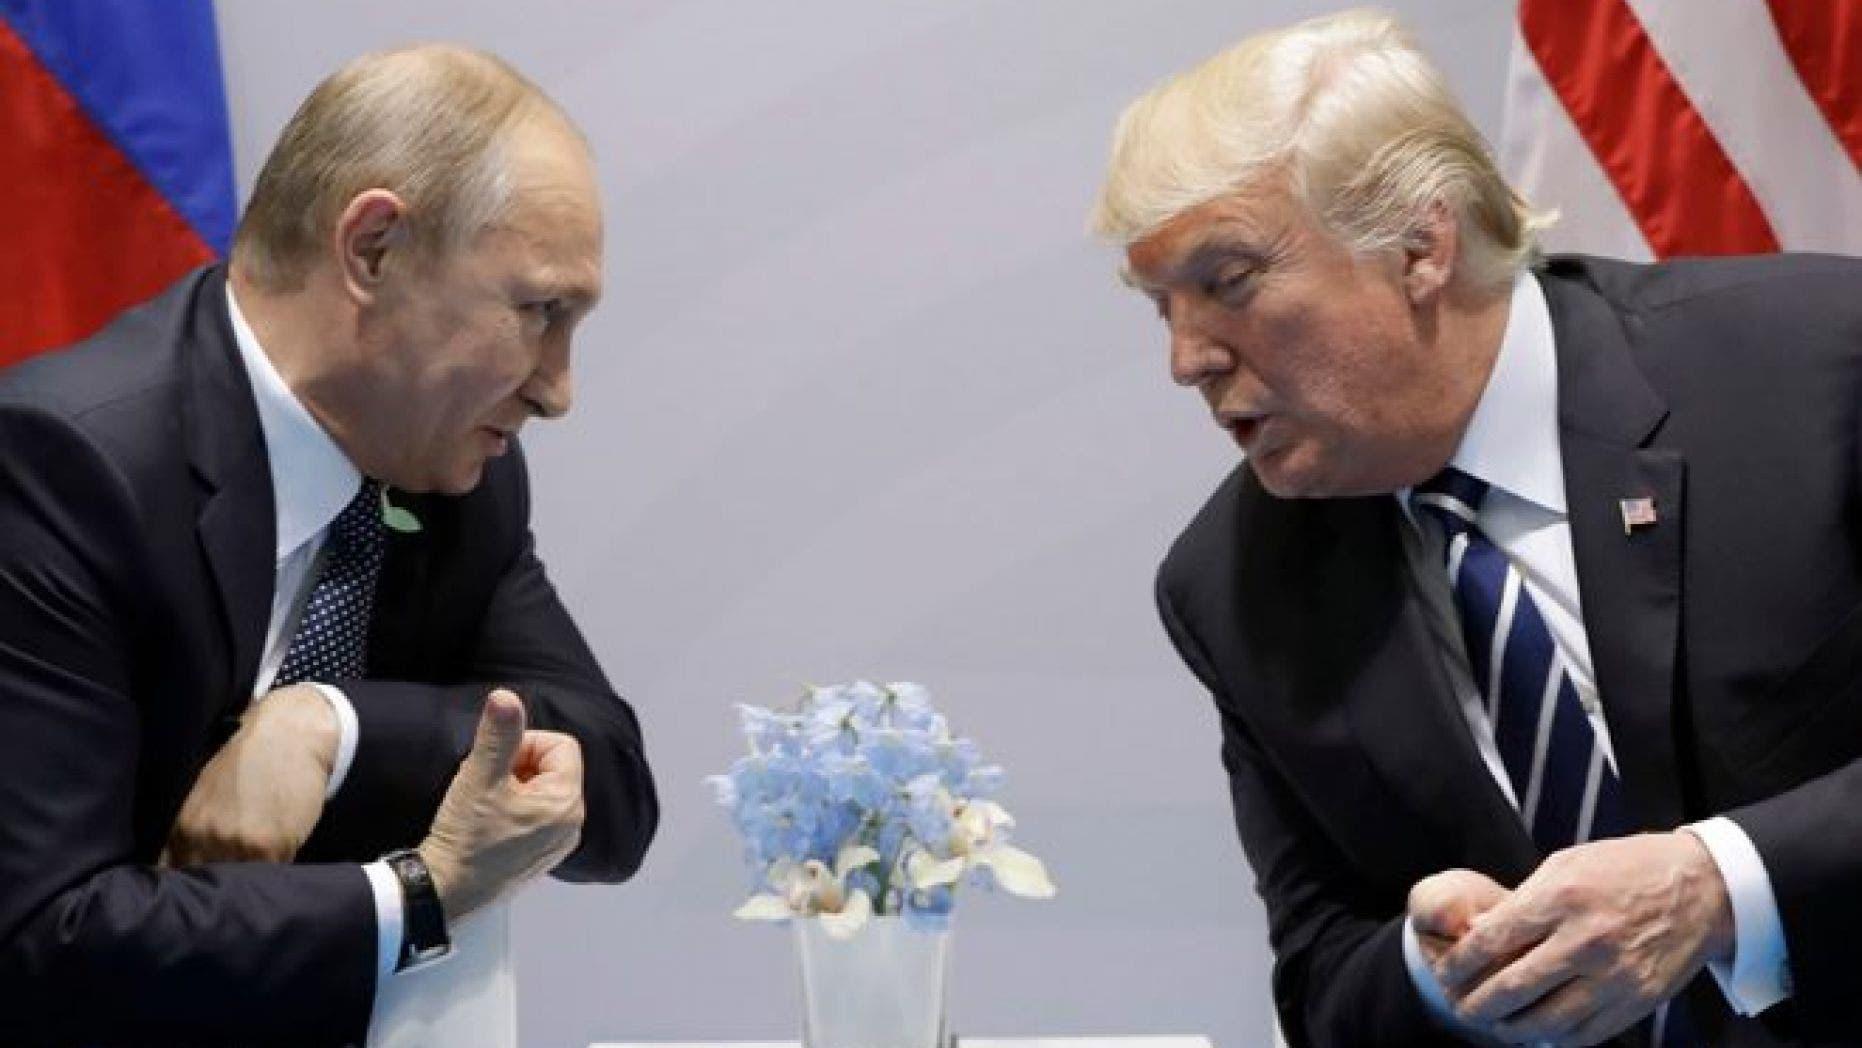 Putin orders 'symmetrical response' to US missile test